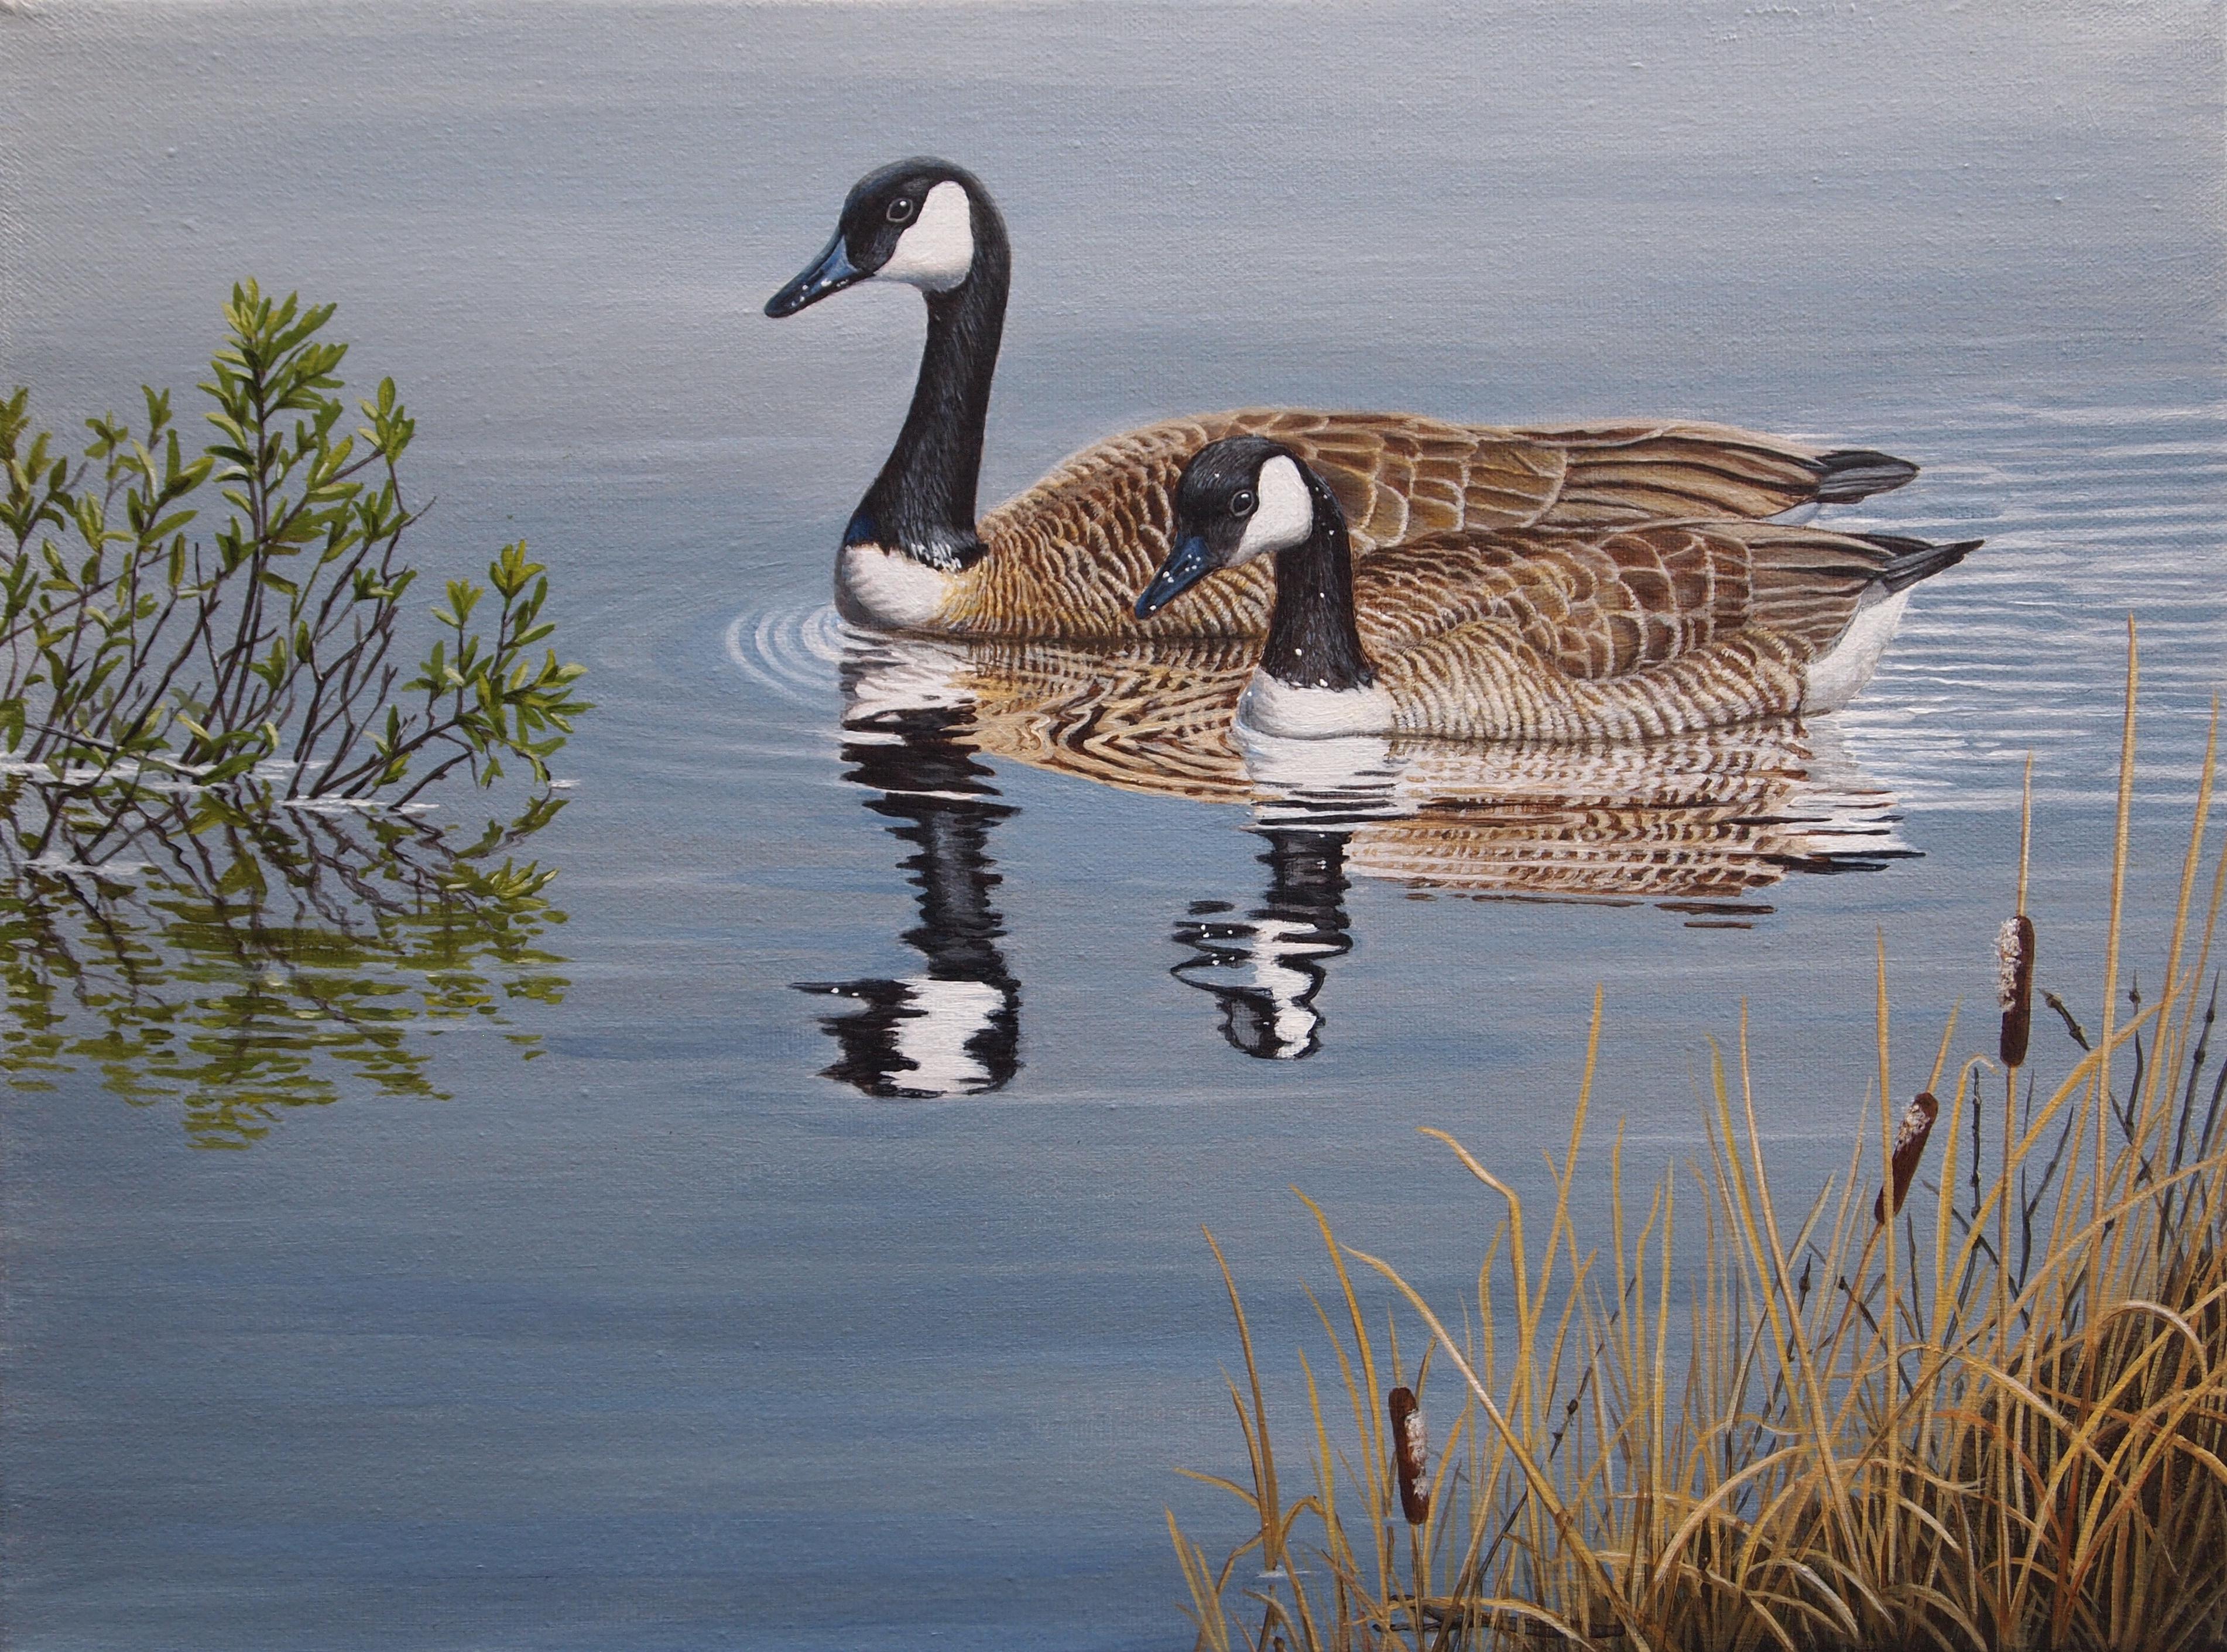 Ron Plaizier - Canada Geese